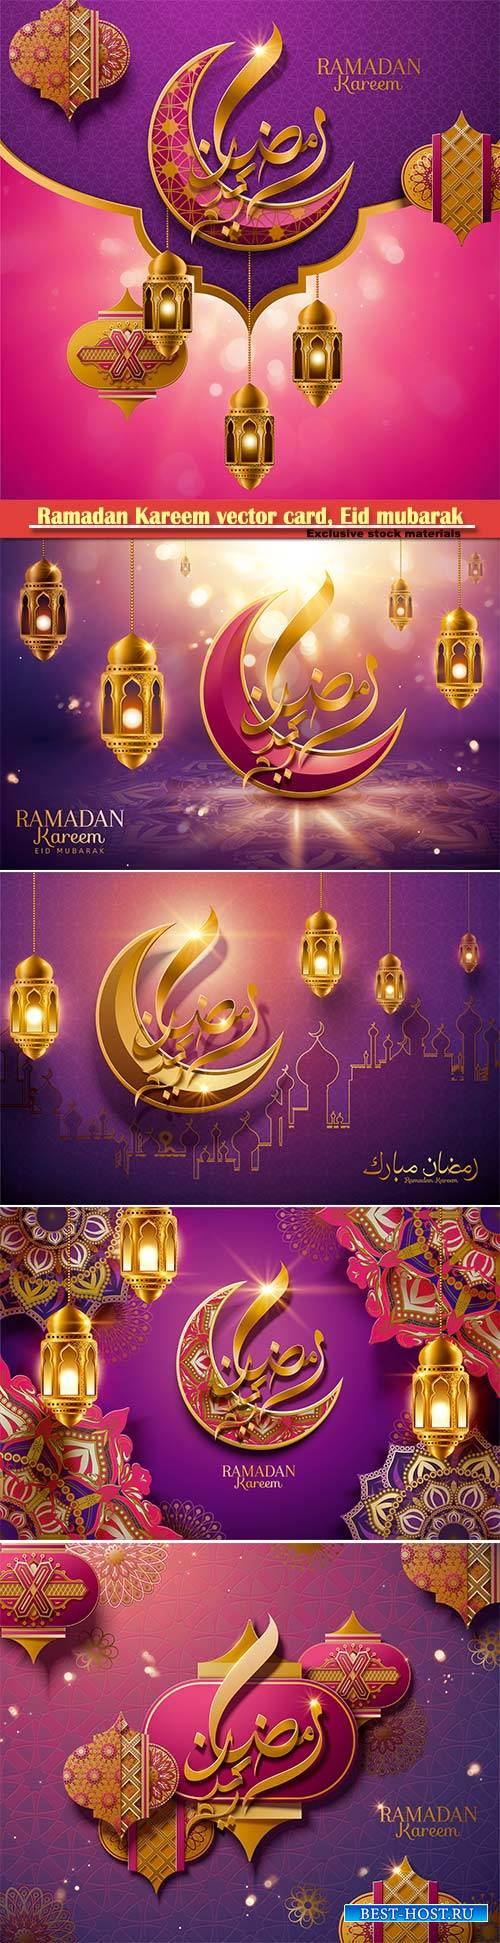 Ramadan Kareem vector card, Eid mubarak calligraphy design templates # 6